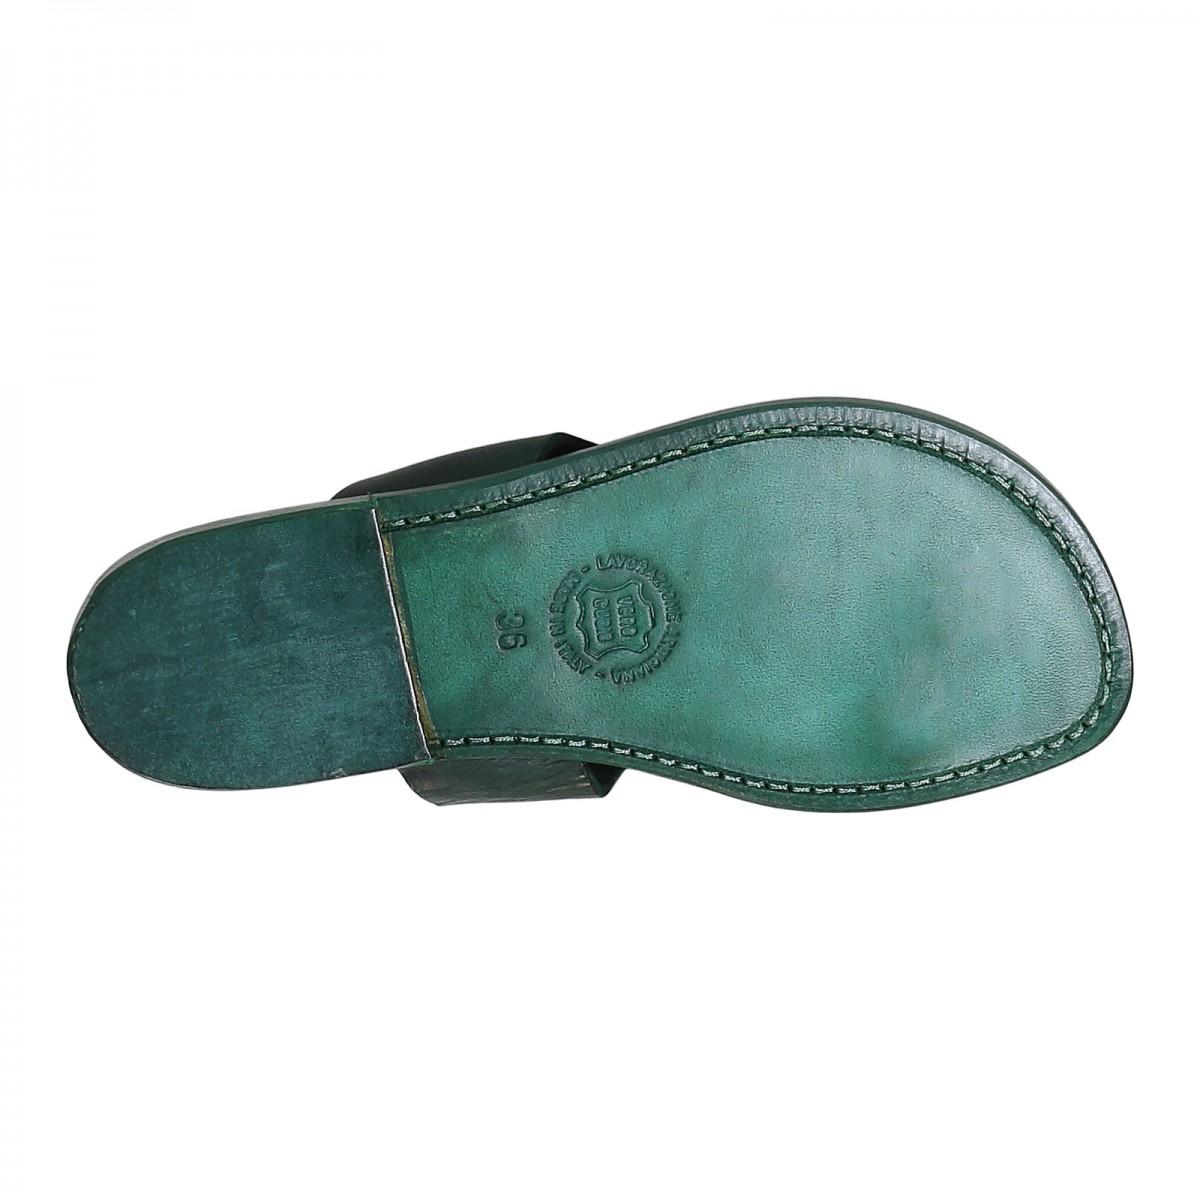 2ecc7f563fe8 ... Green leather thong sandals for women handmade